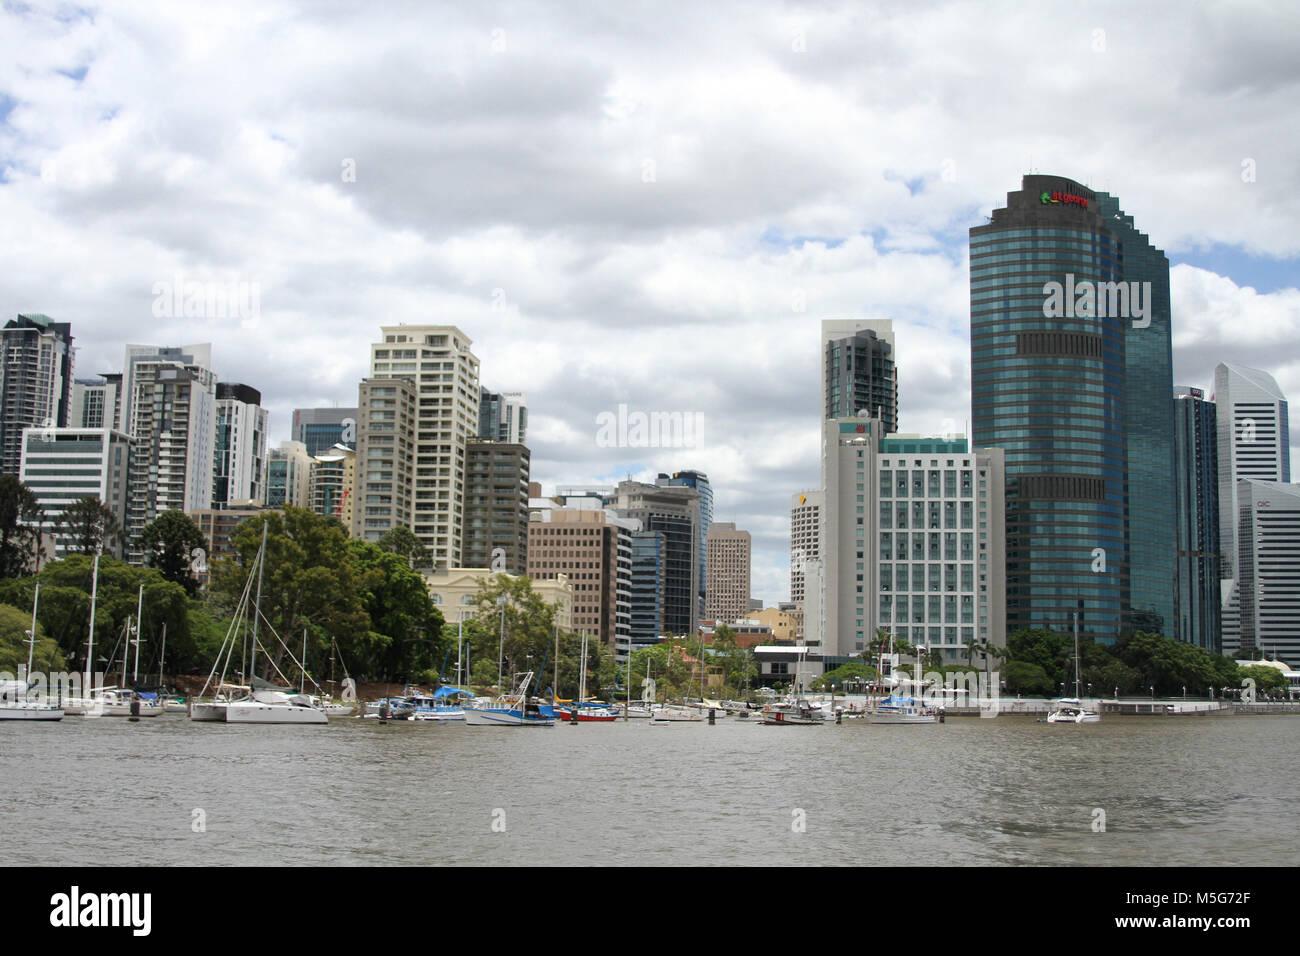 Cityscape of Brisbane CBD with Brisbane River in the foreground, Brisbane, Australia - Stock Image